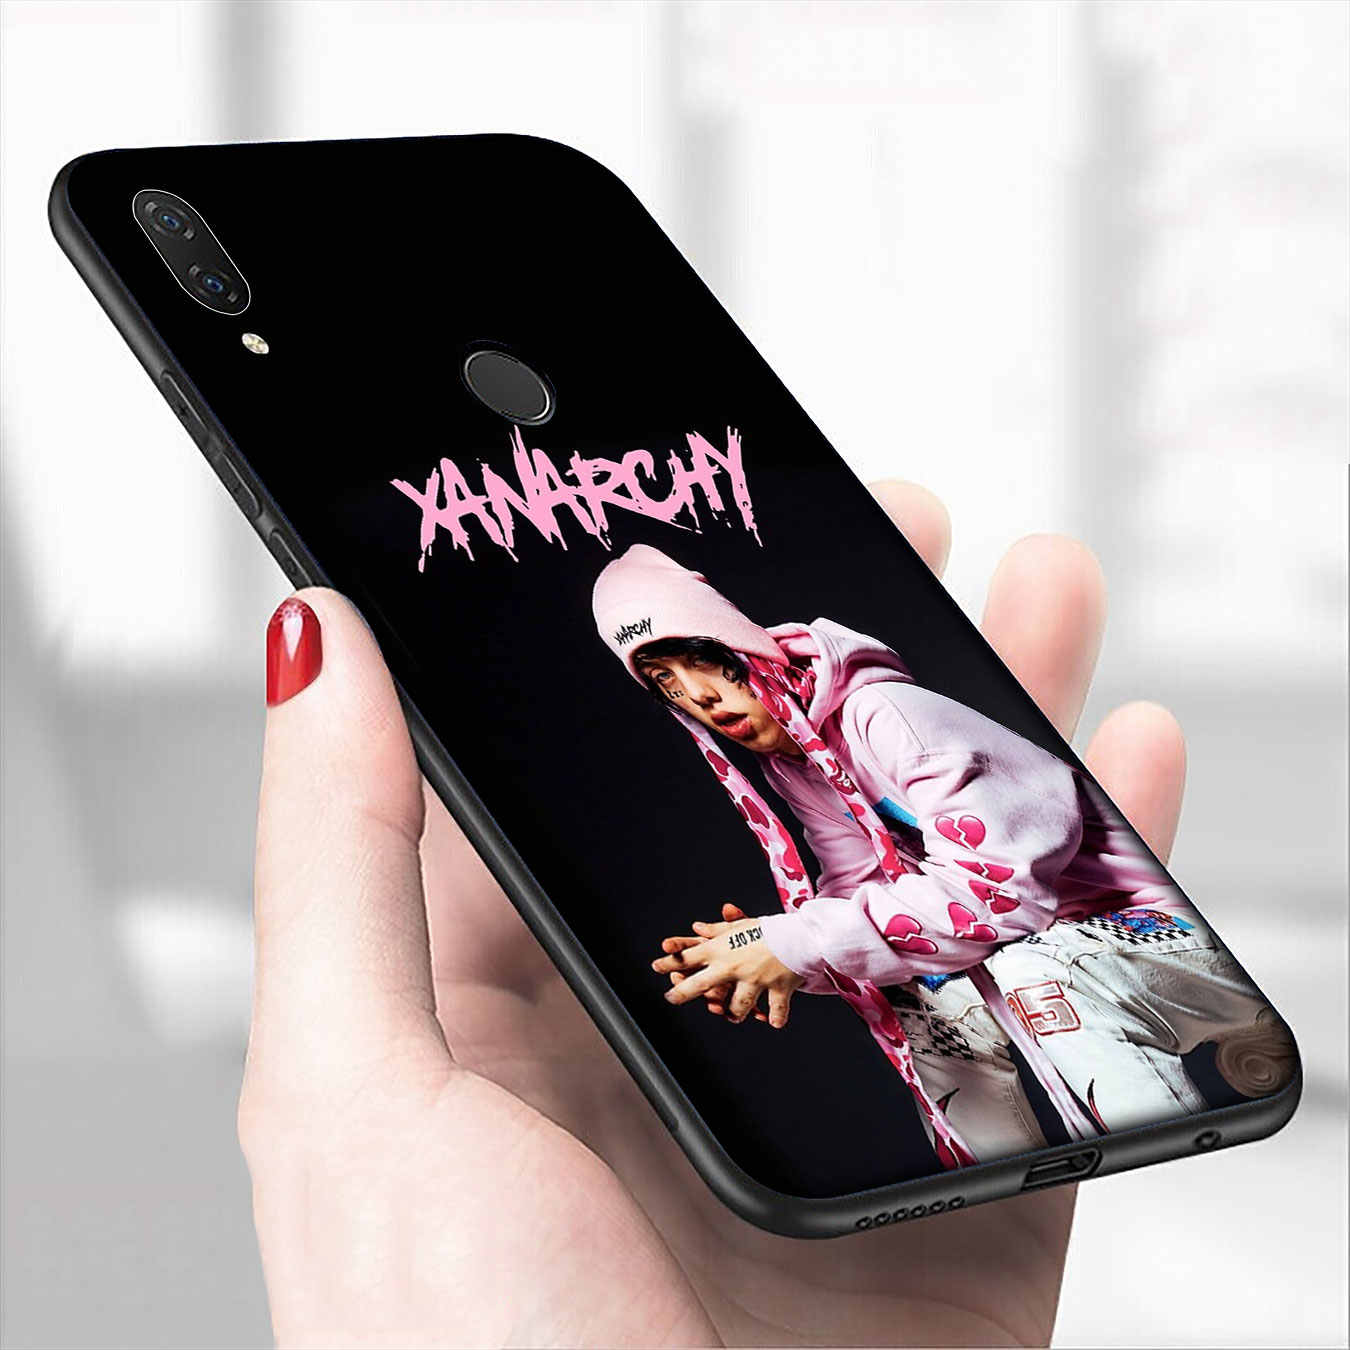 IYICAO ליל Xan Lilxan חם זינגר רך סיליקון טלפון מקרה עבור Xiaomi Redmi הערה 8 8T 8A 7 7A 6 6A 5 5A ללכת S2 K30 K20 פרו כיסוי